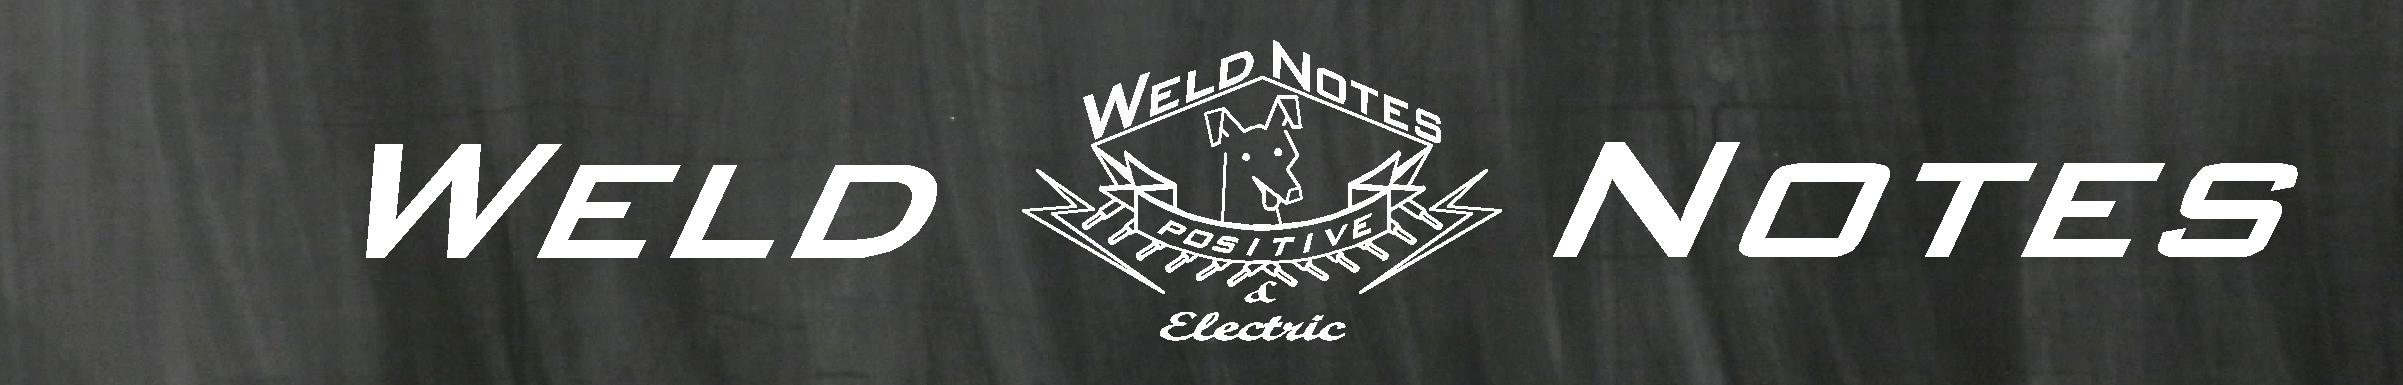 WeldNotes.com